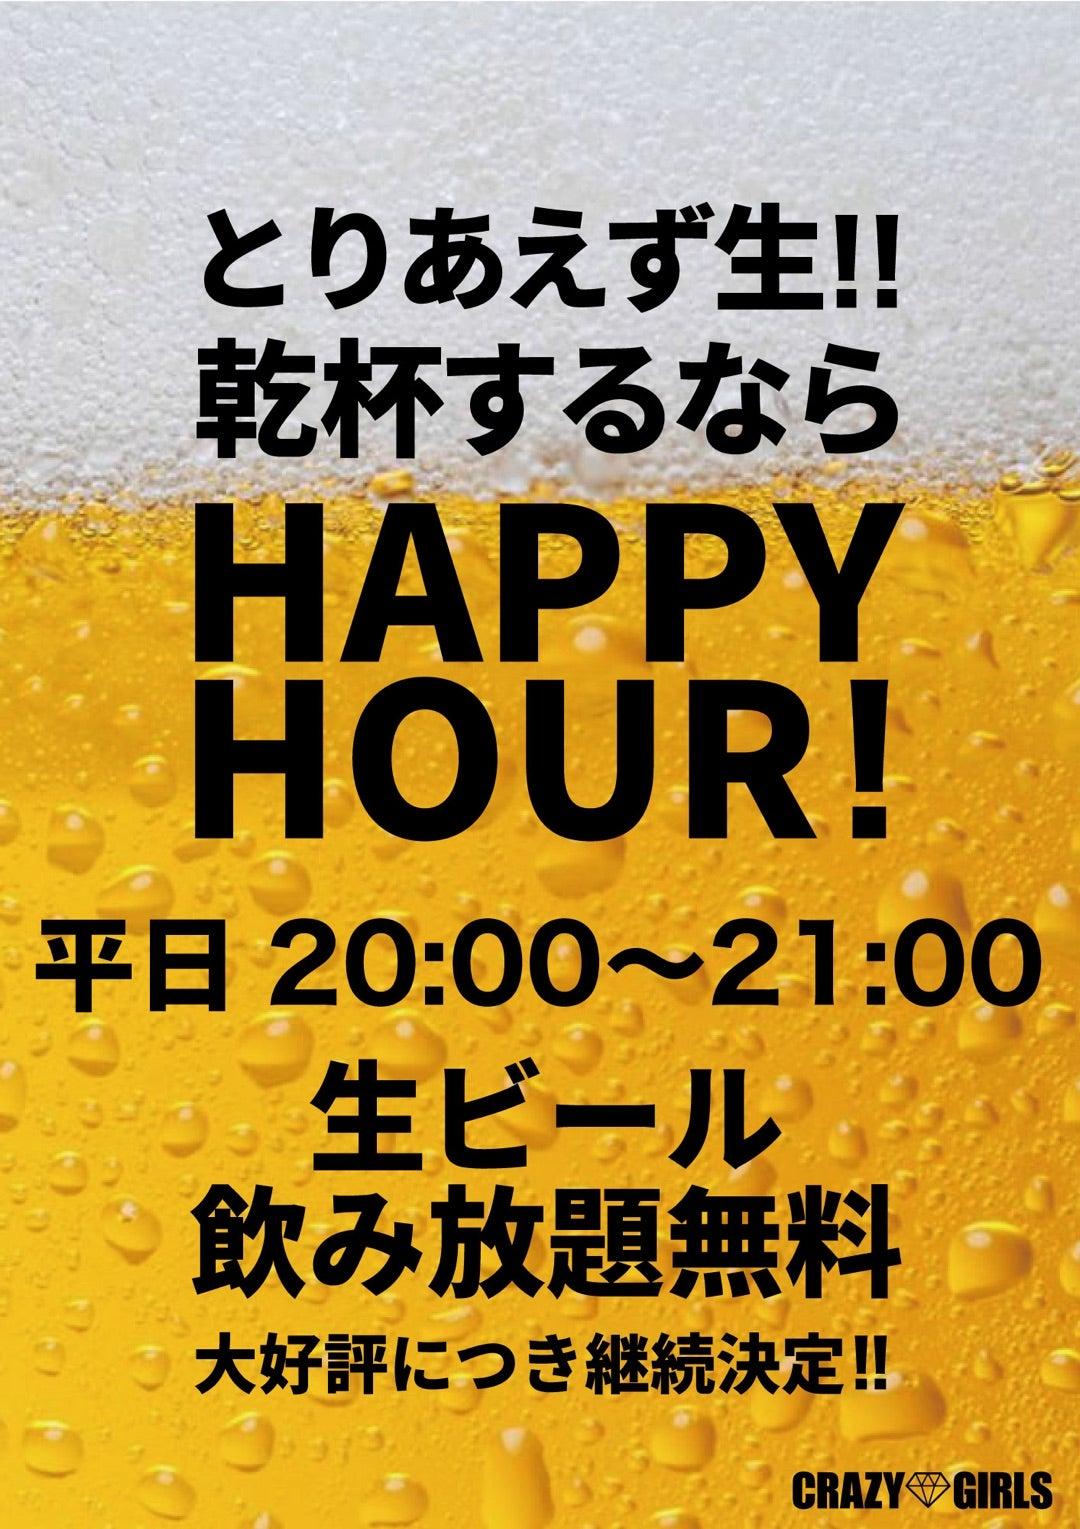 HAPPY HOUR!生ビール飲み放題無料!